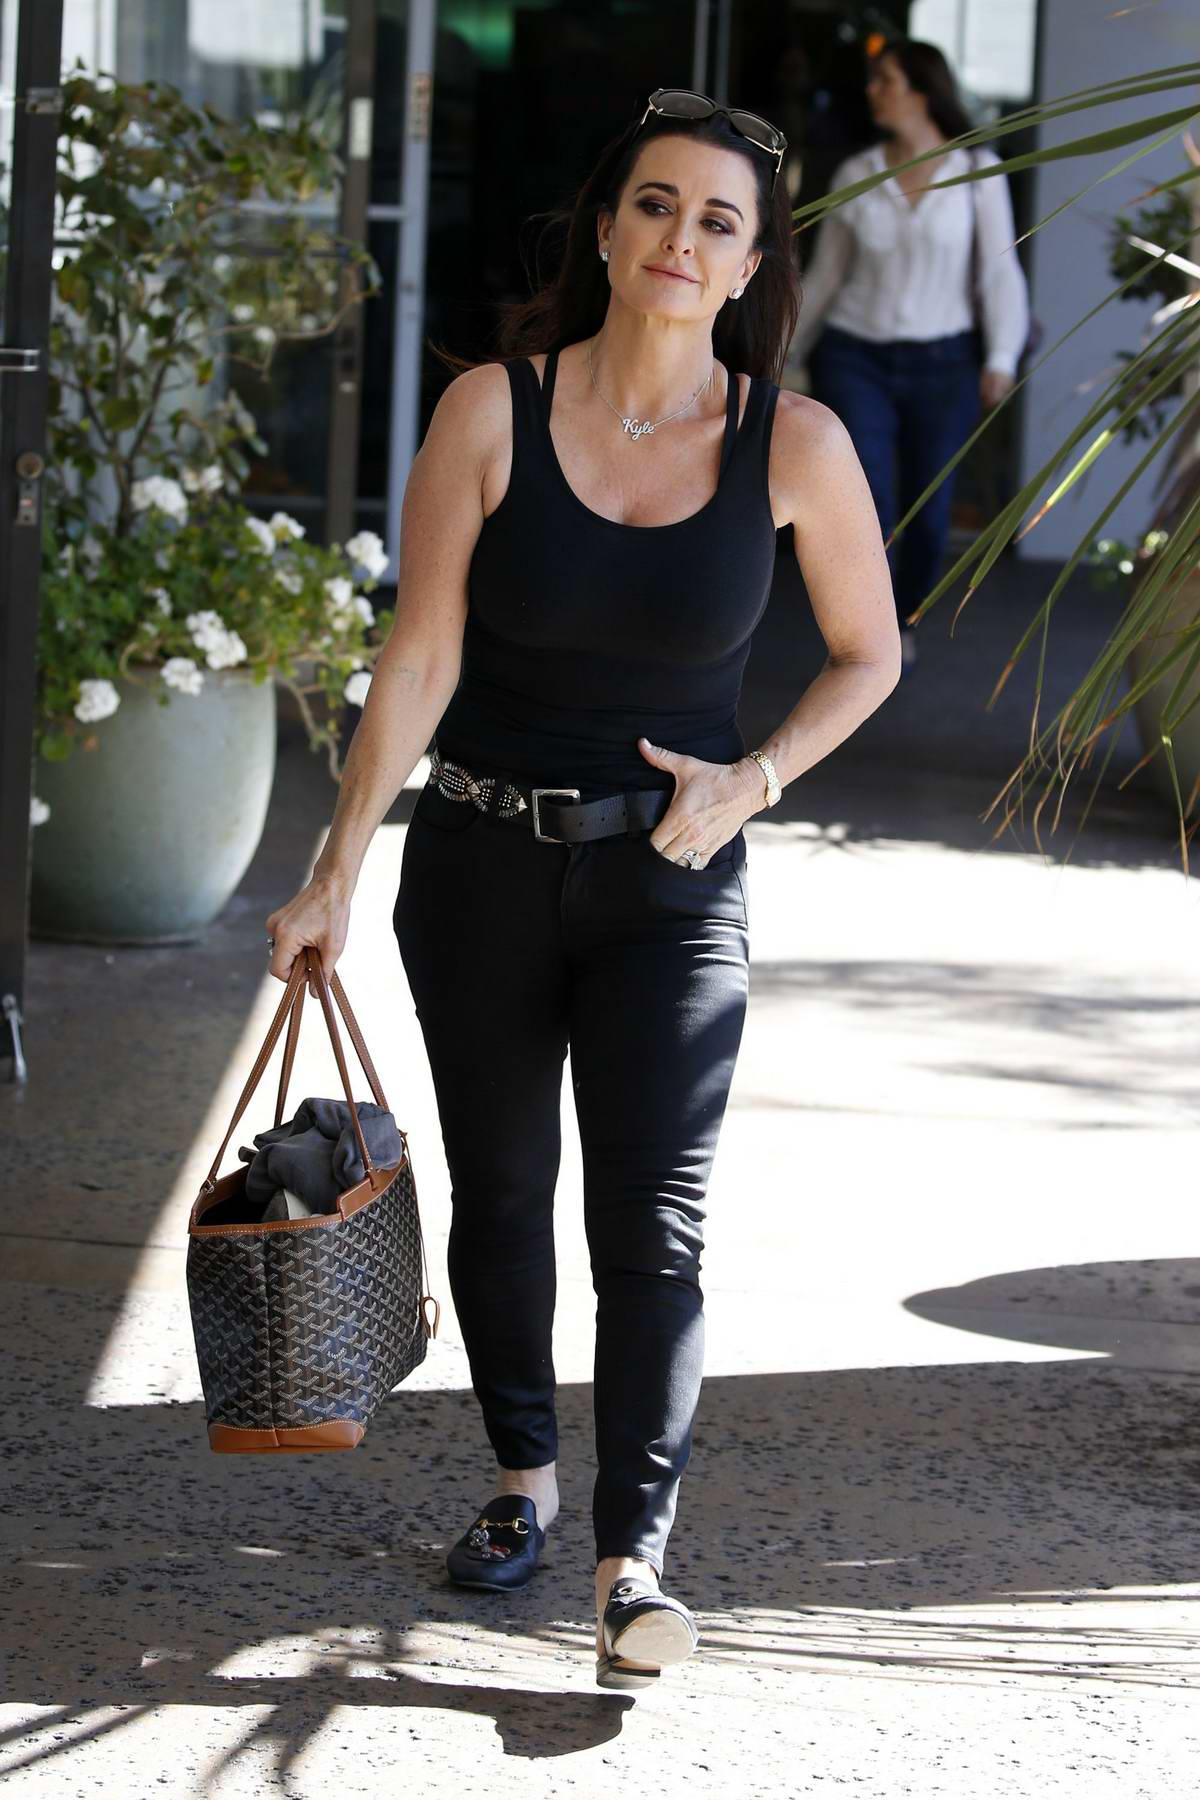 Kyle Richards is seen running errands in Bel-Air, Los Angeles